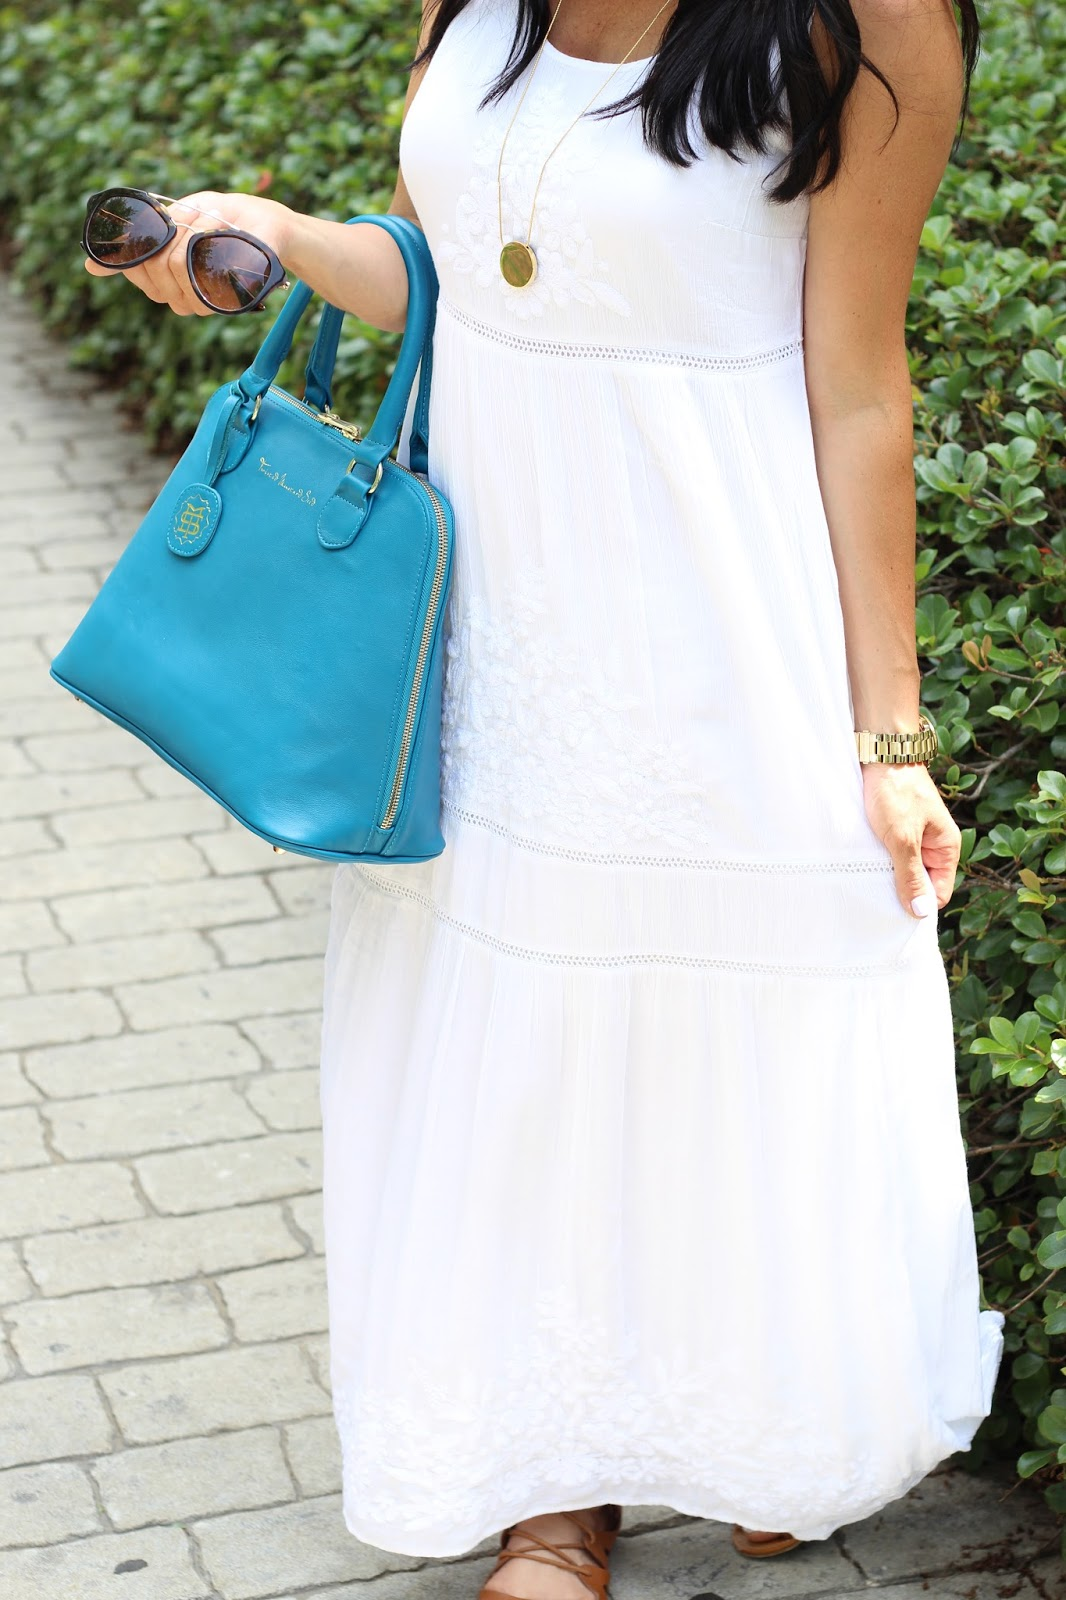 White embroidered maxi dress, turquoise bag, prada sunglasses